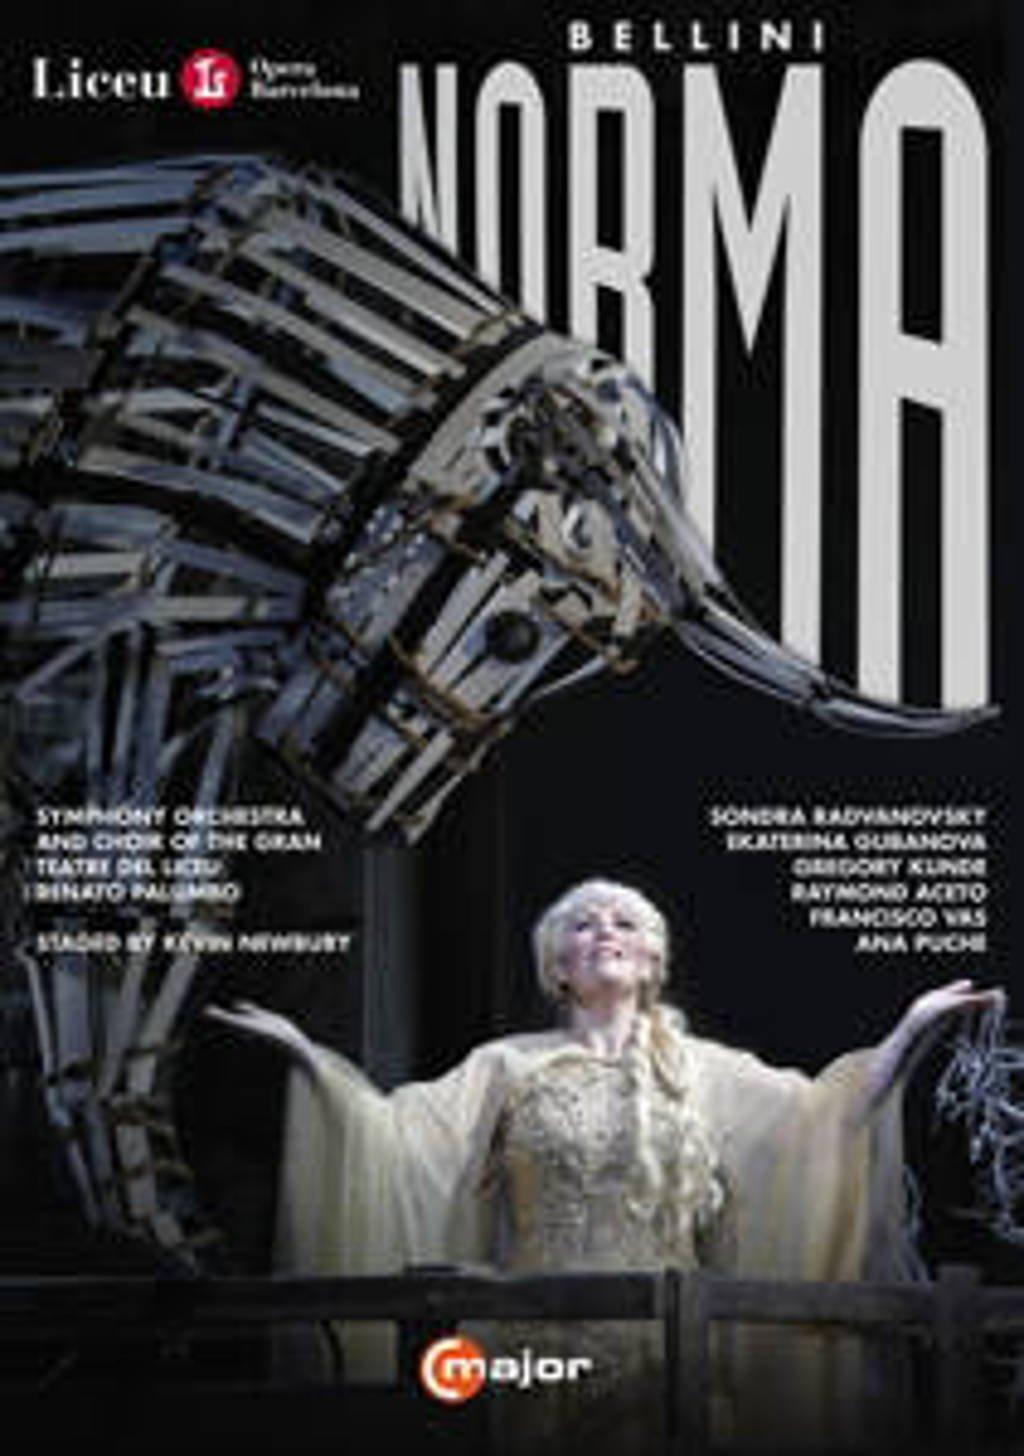 Radvanovsky & Kunde & Gubanova & Gr - Norma (DVD)